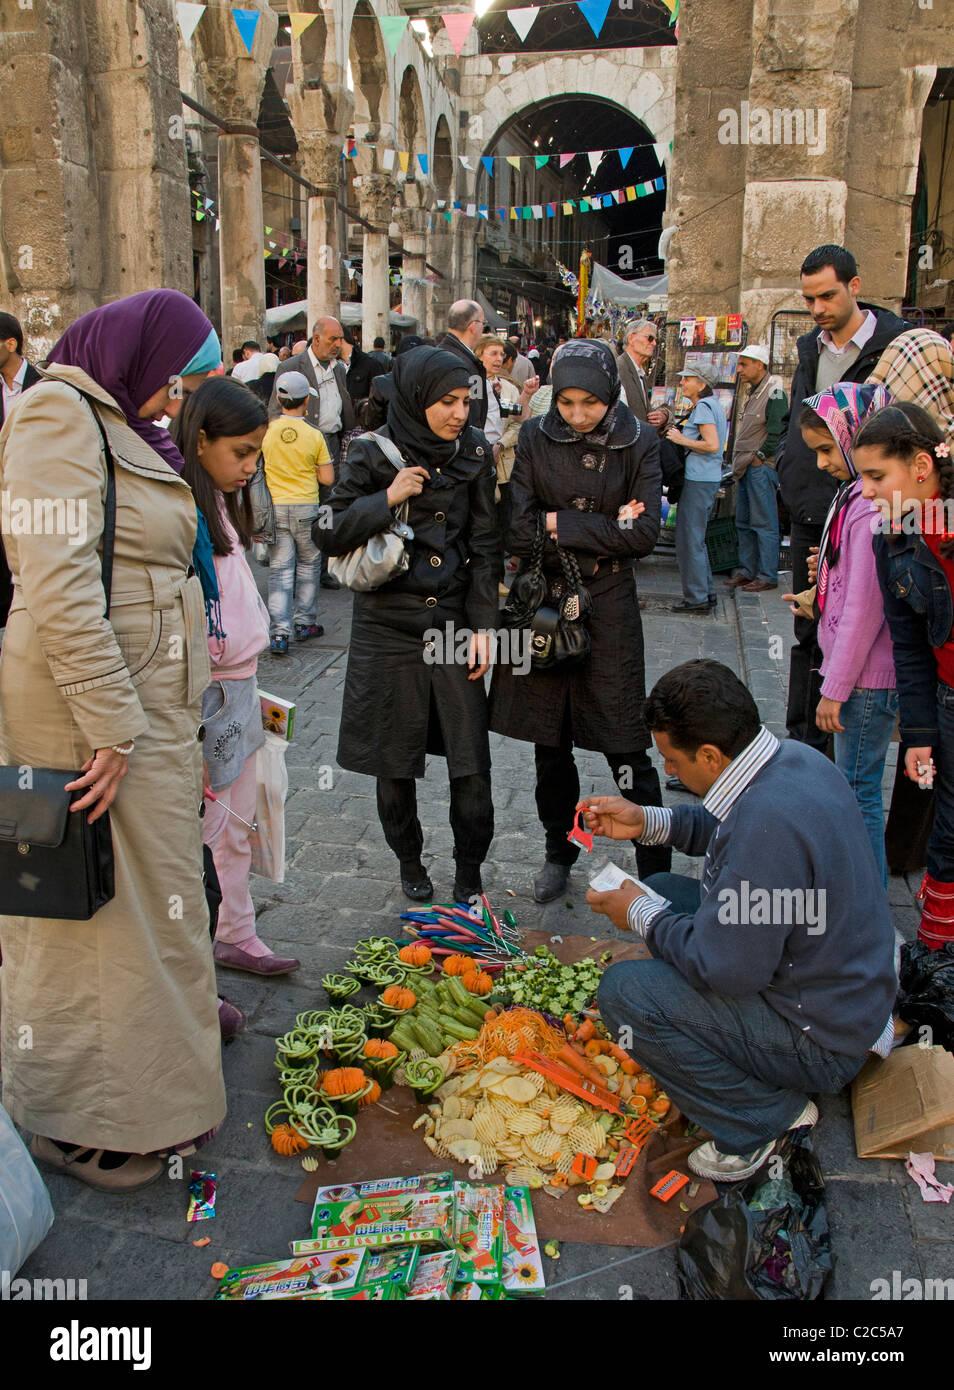 Damascus Syria Bazaar kitchen cutter vegetables fruit  Souq market - Stock Image